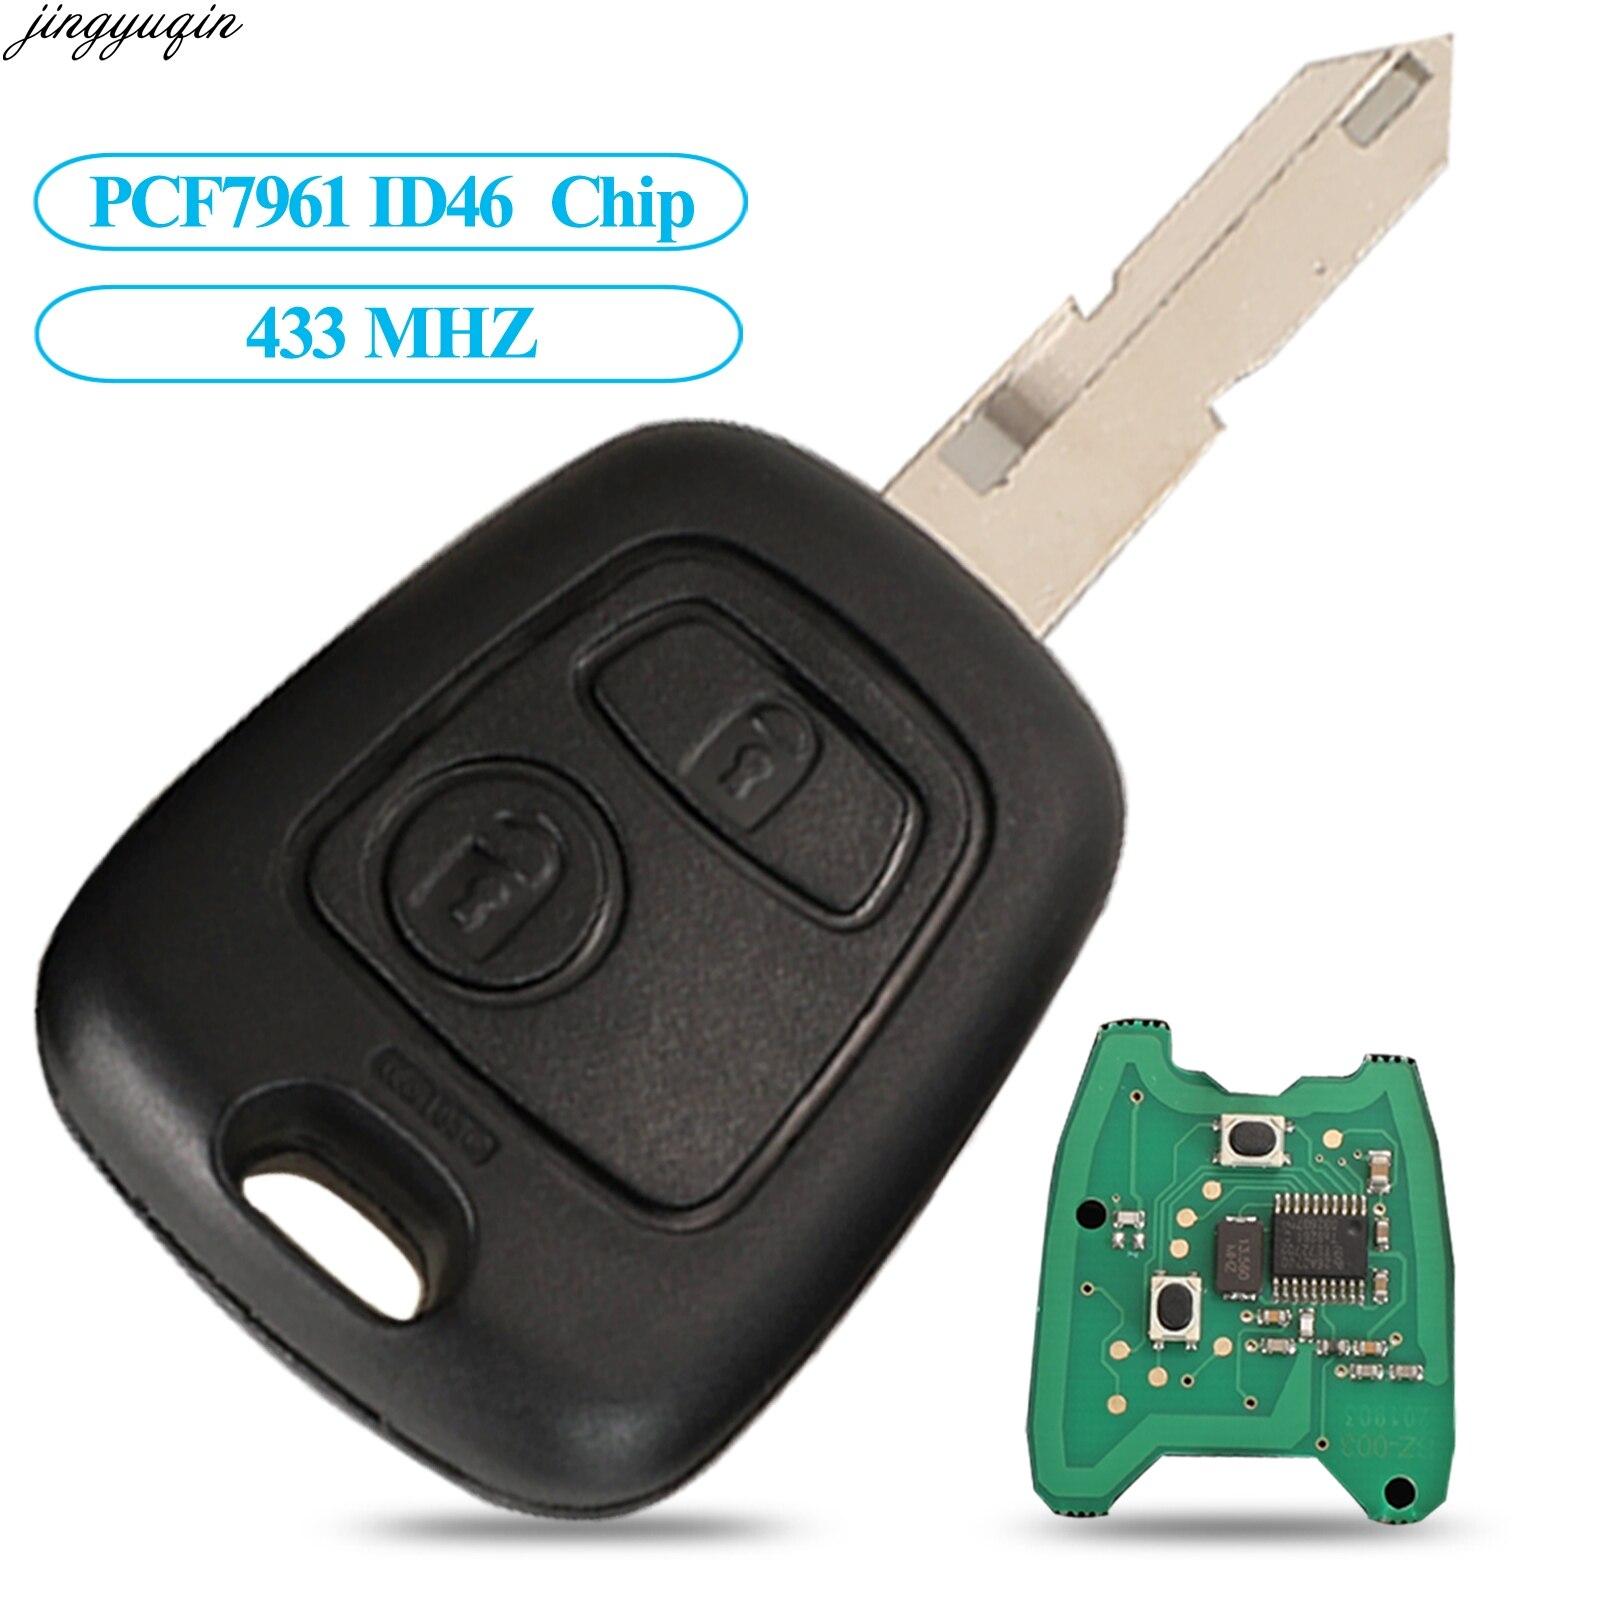 Remote Key Fob pulsante 3 A per Citroen C2 C6 C3 C4 C5 C8 XSARA PICASSO